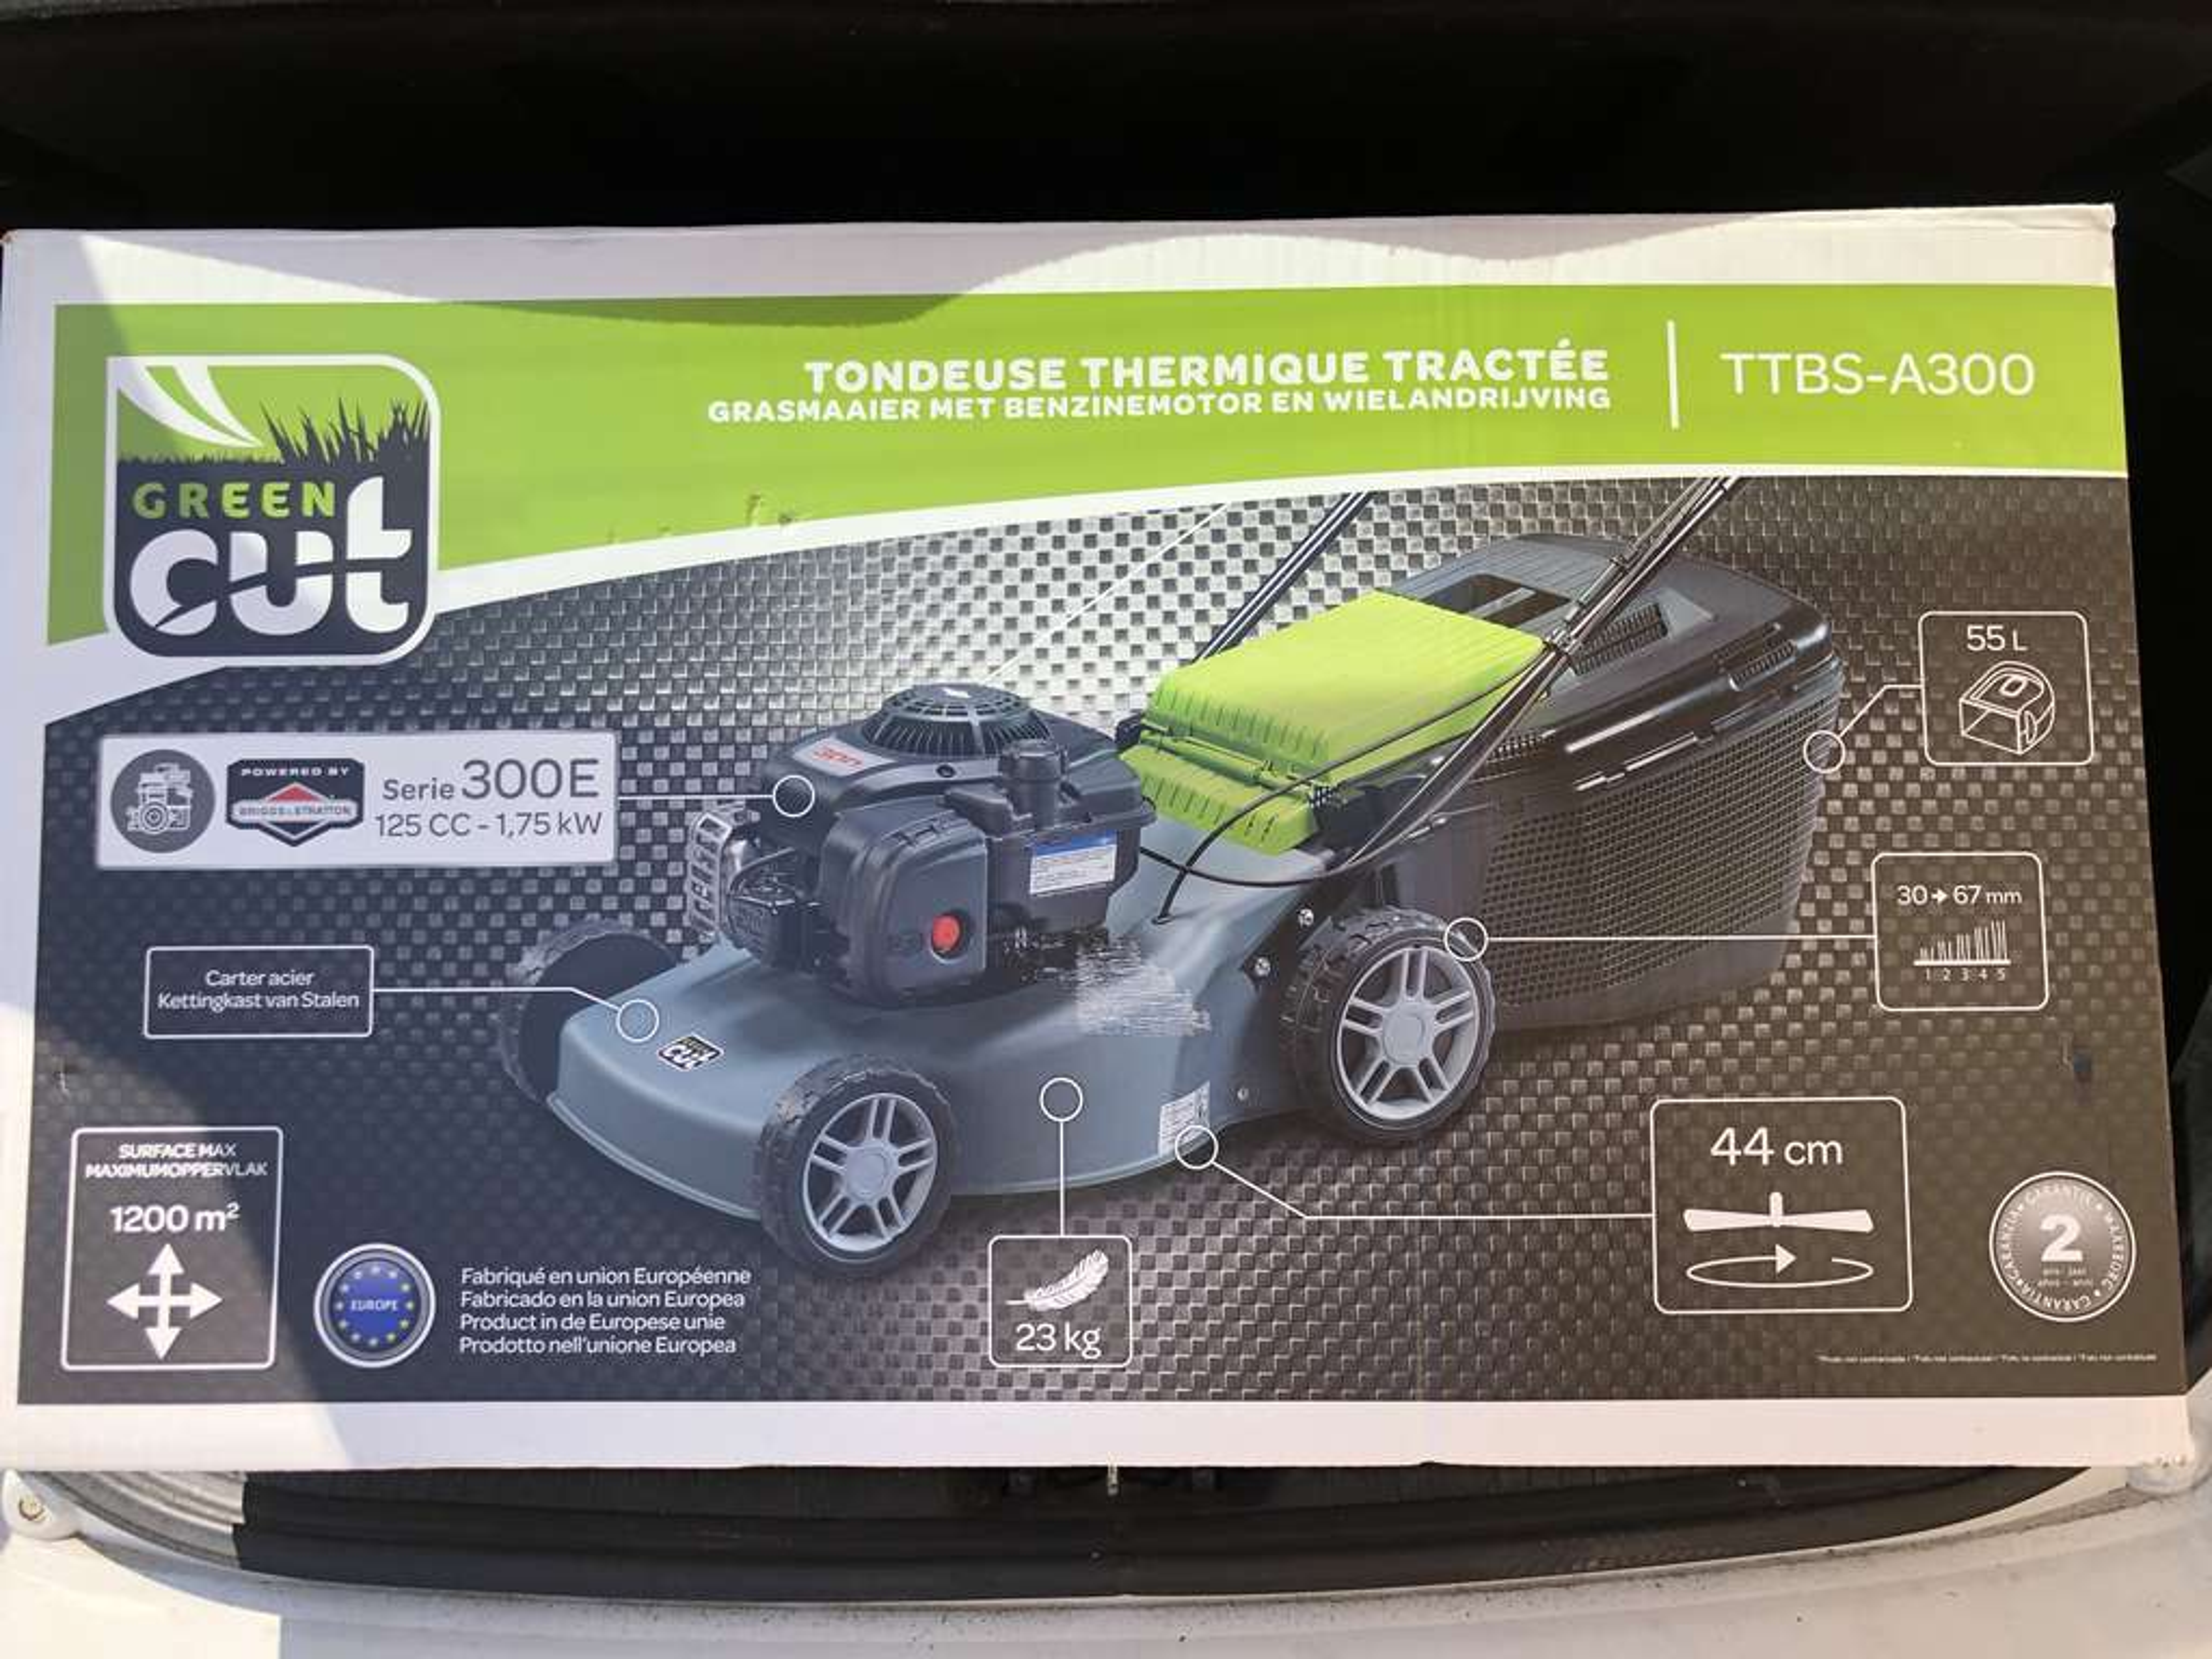 tondeuse thermique tract e green cut ttbs a300 44 cm. Black Bedroom Furniture Sets. Home Design Ideas